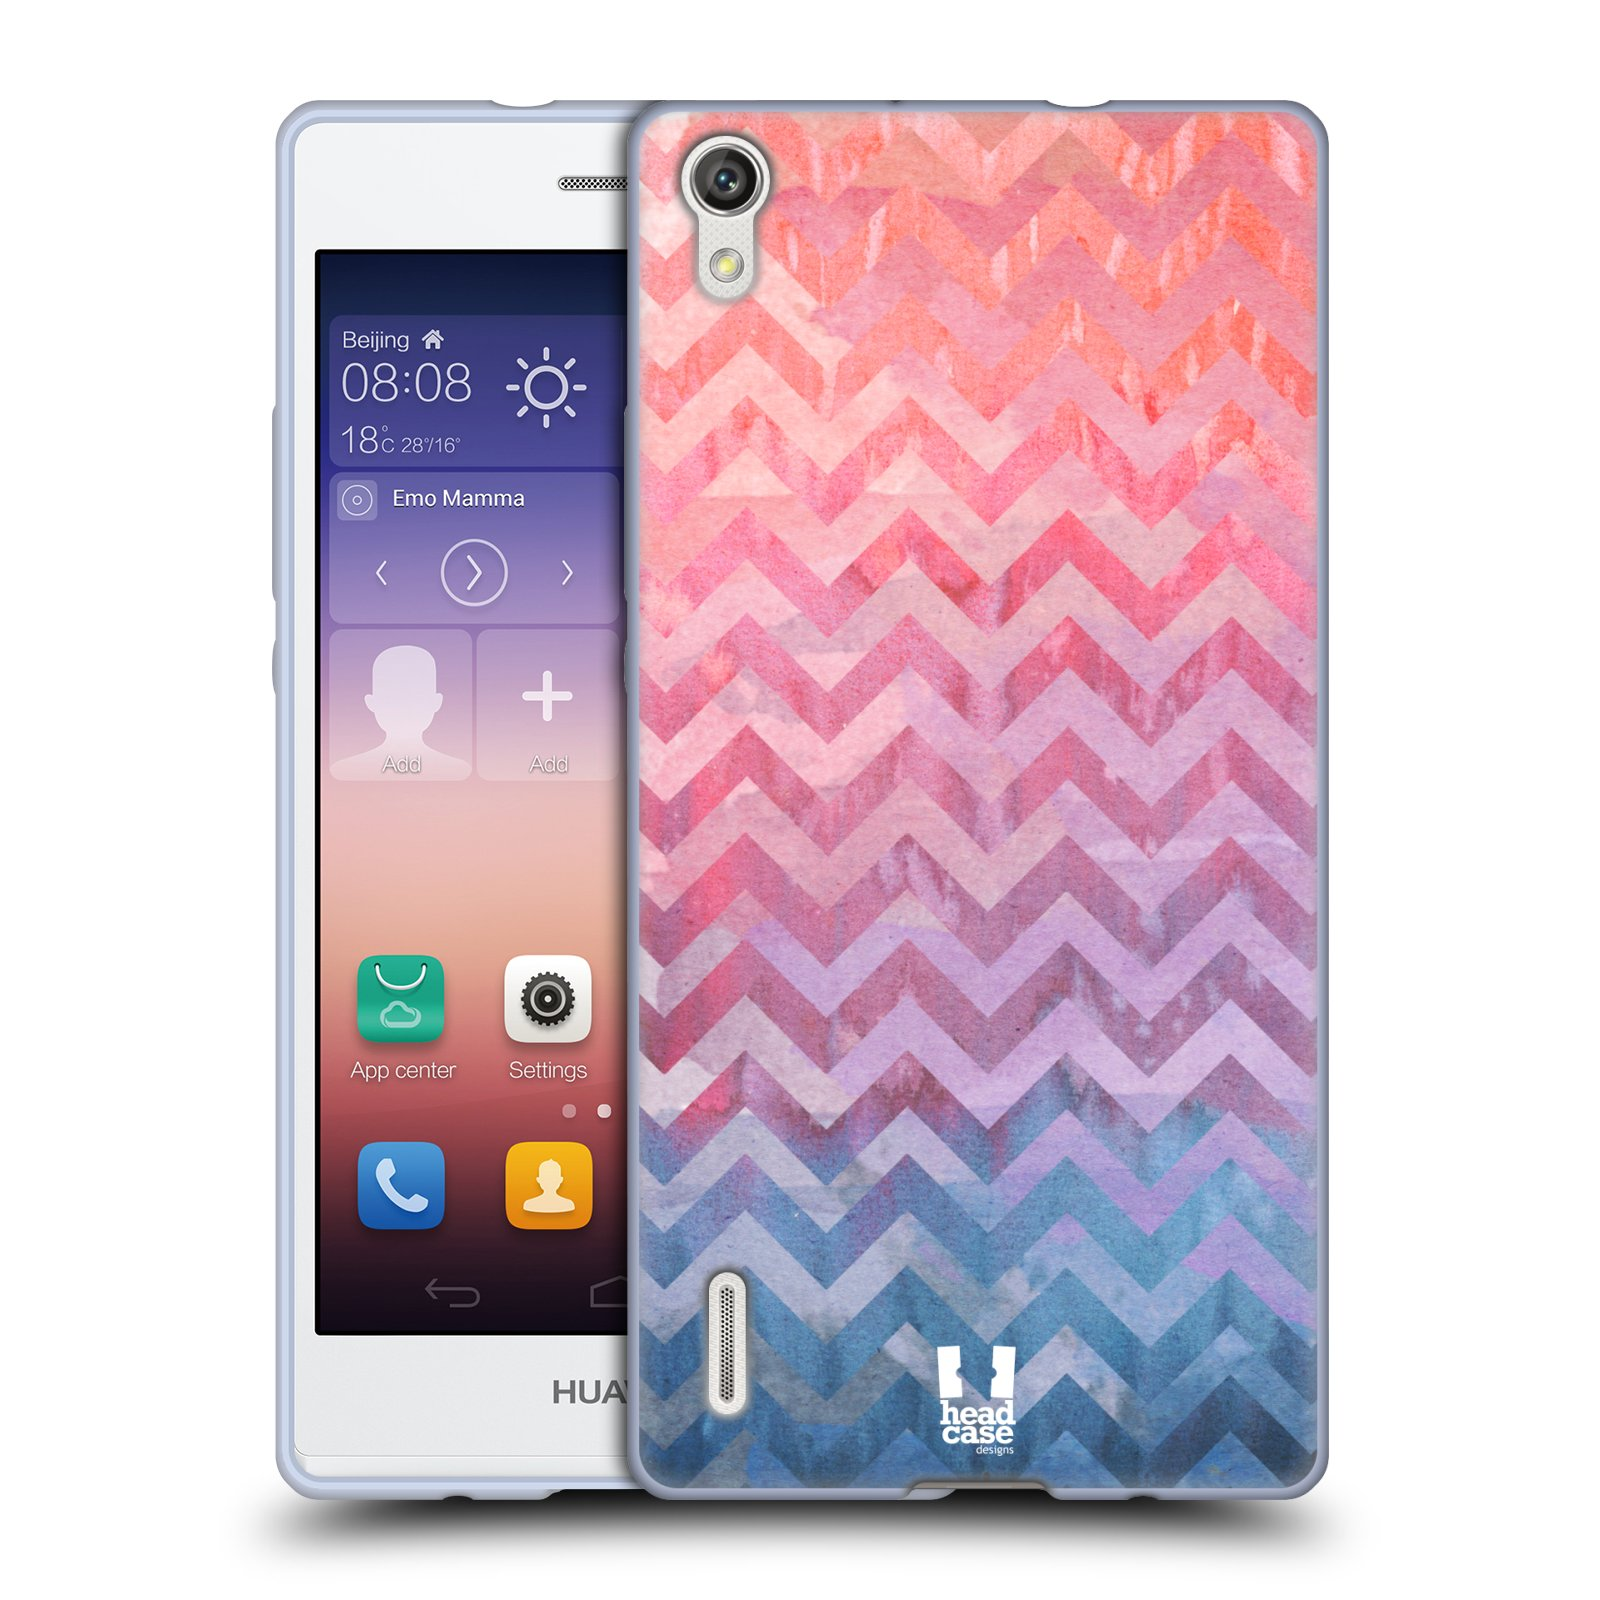 Silikonové pouzdro na mobil Huawei P7 HEAD CASE Pink Chevron (Silikonový kryt či obal na mobilní telefon Huawei Ascend P7)